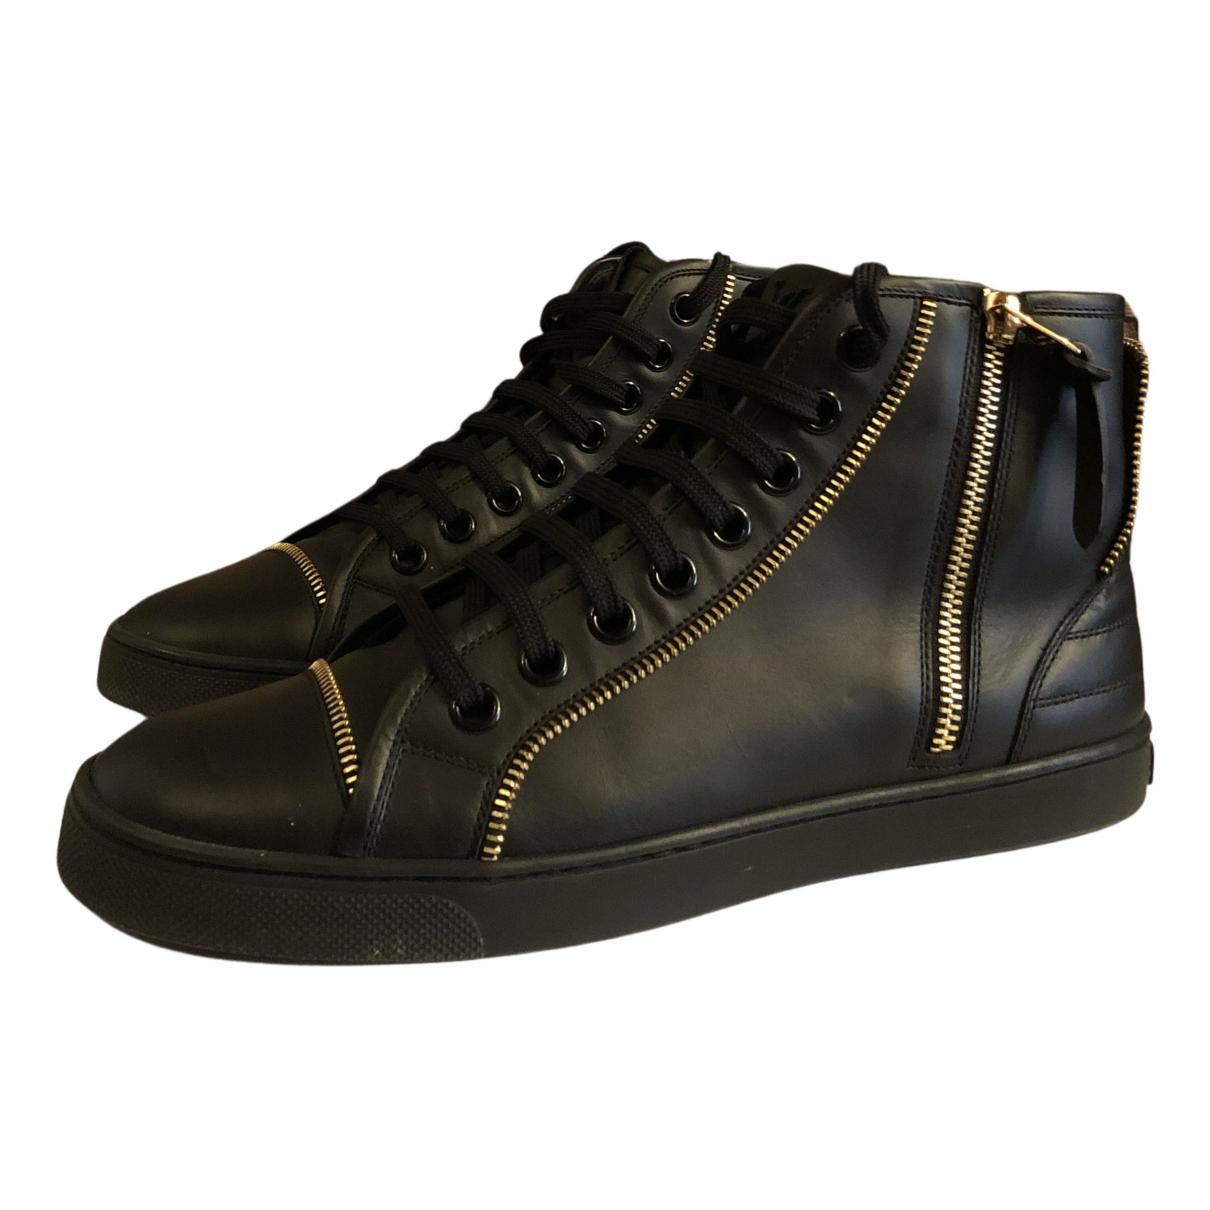 Louis Vuitton N Black Leather Trainers for Women 38 EU